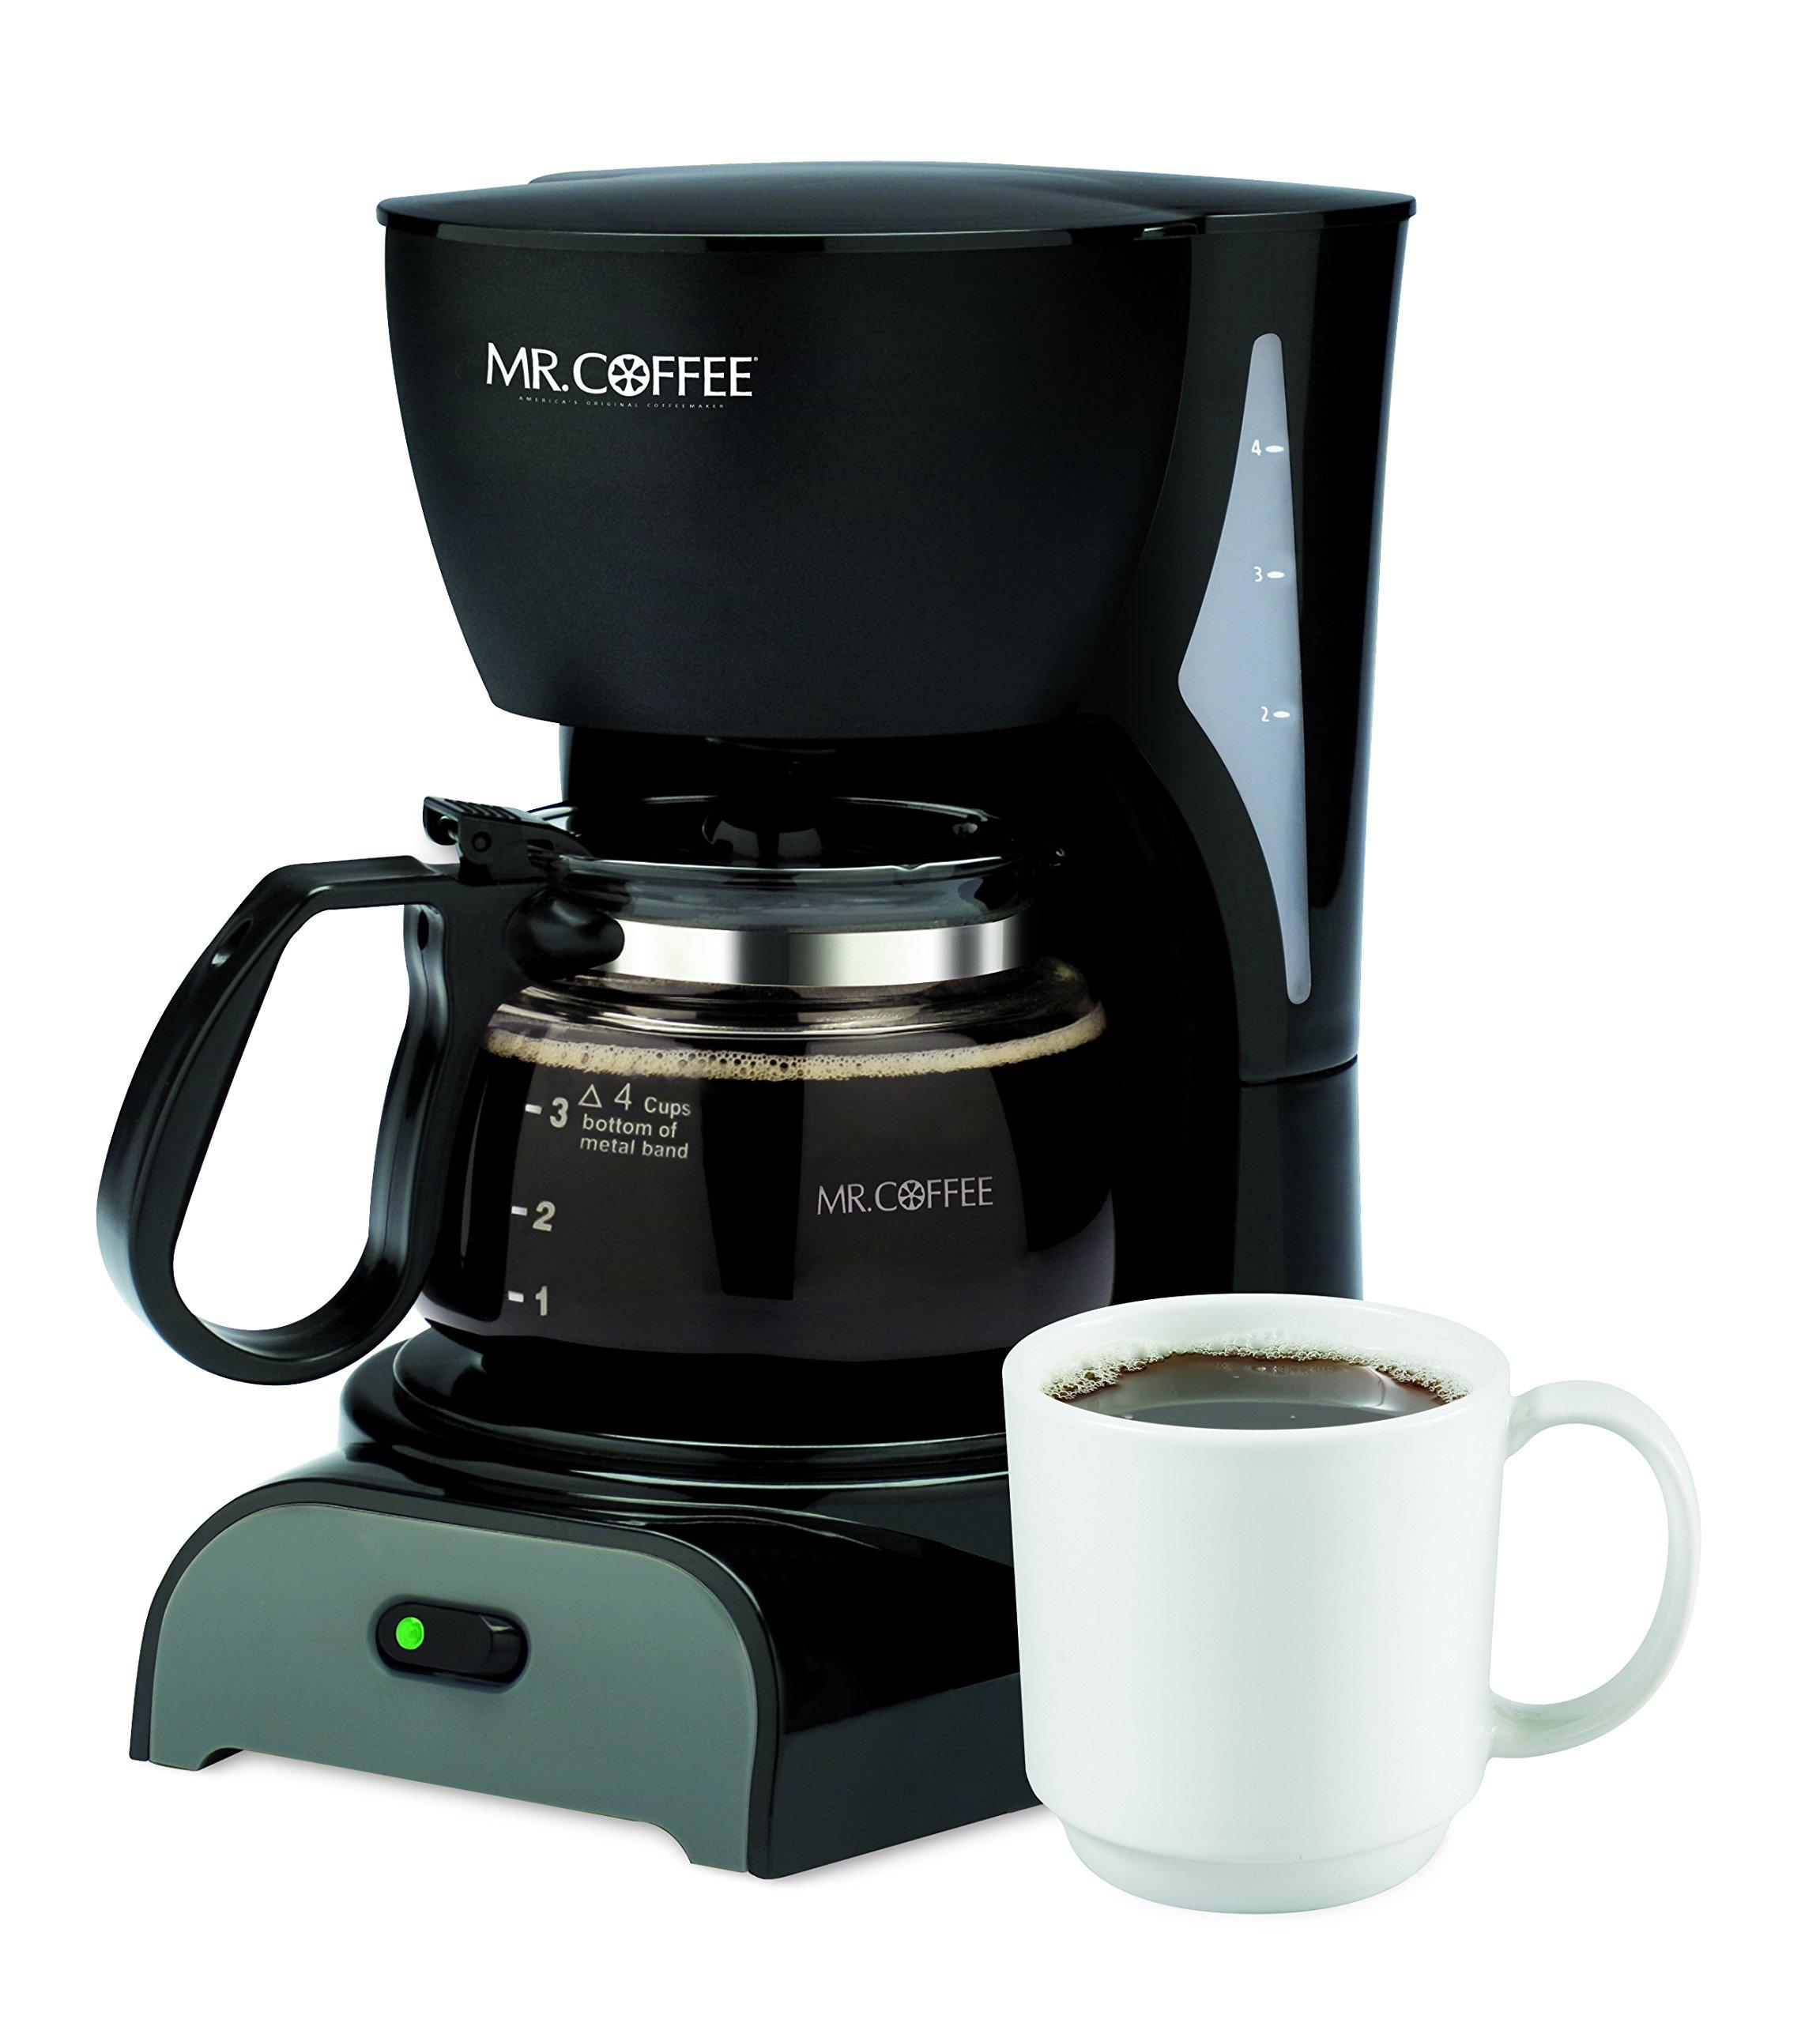 Mr. Coffee Simple Brew 4-Cup Coffee Maker, Black